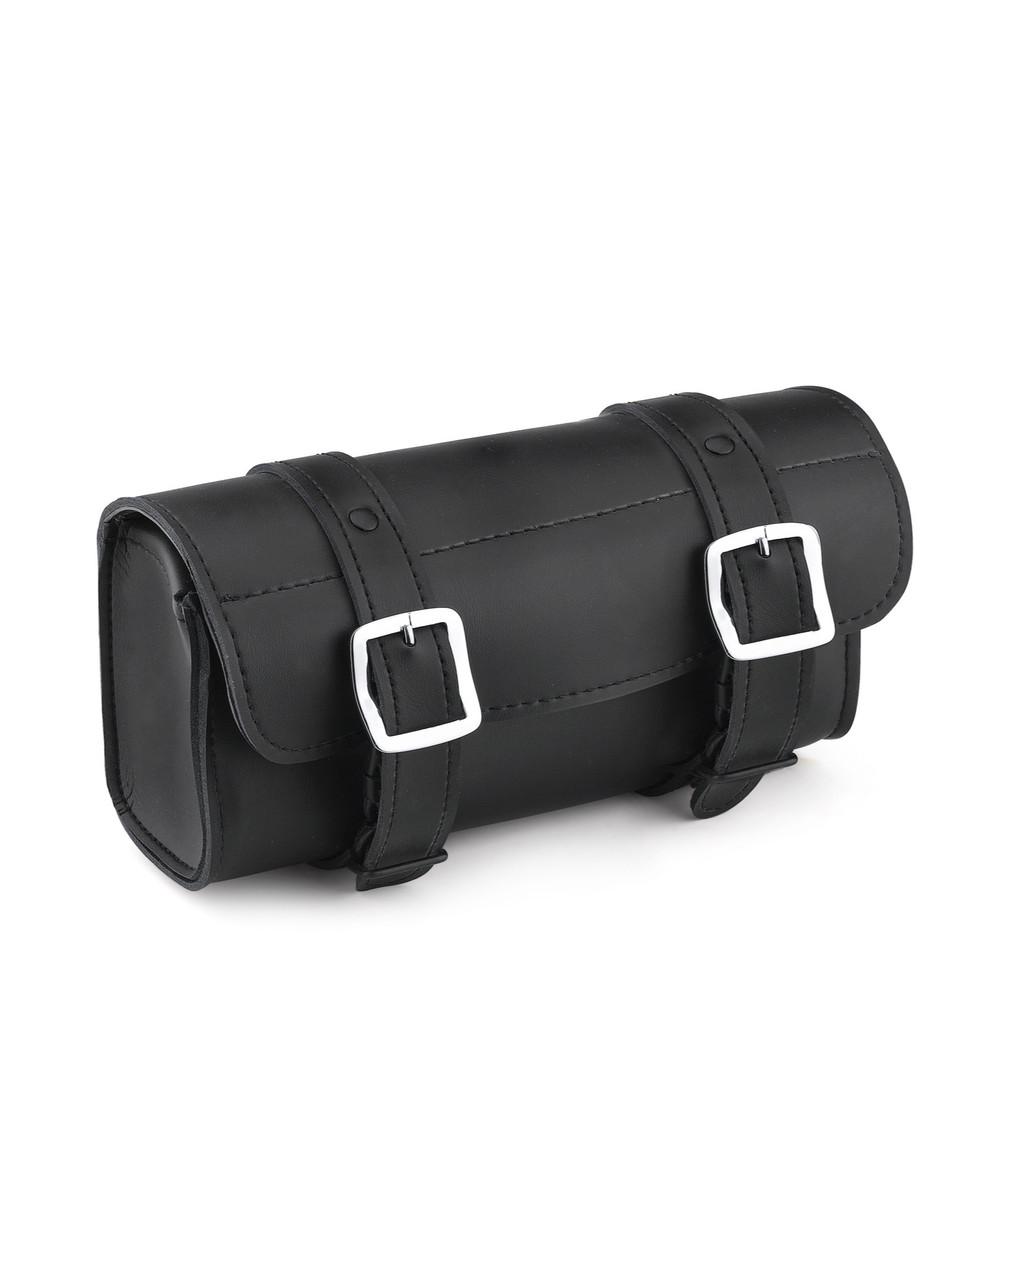 Harley Davidson Armor Plain Motorcycle Tool Bag Main Bag View